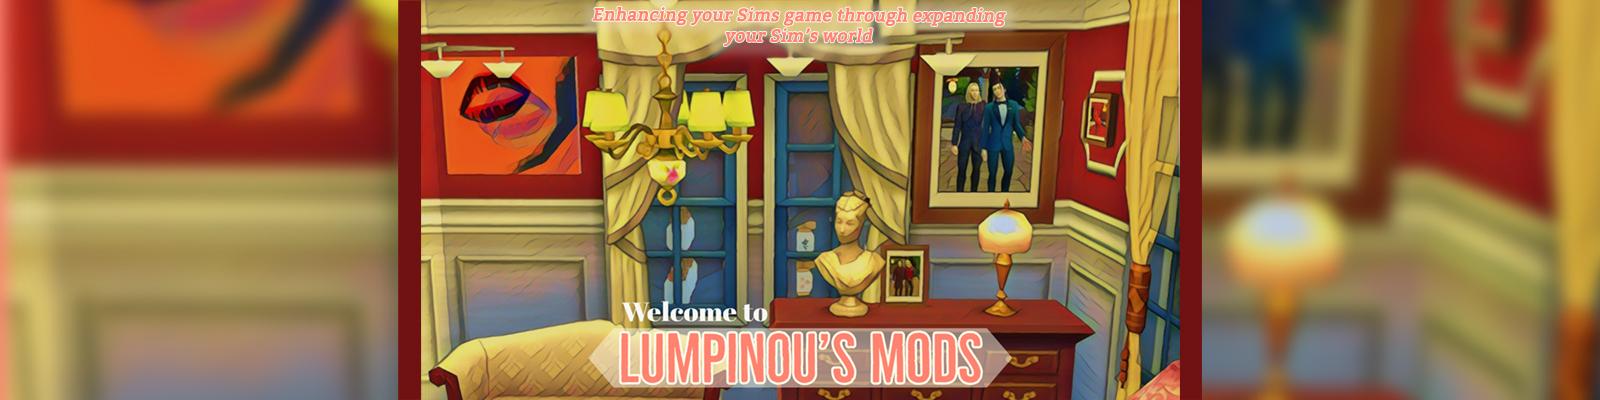 Lumpinou's Sims 4 mods